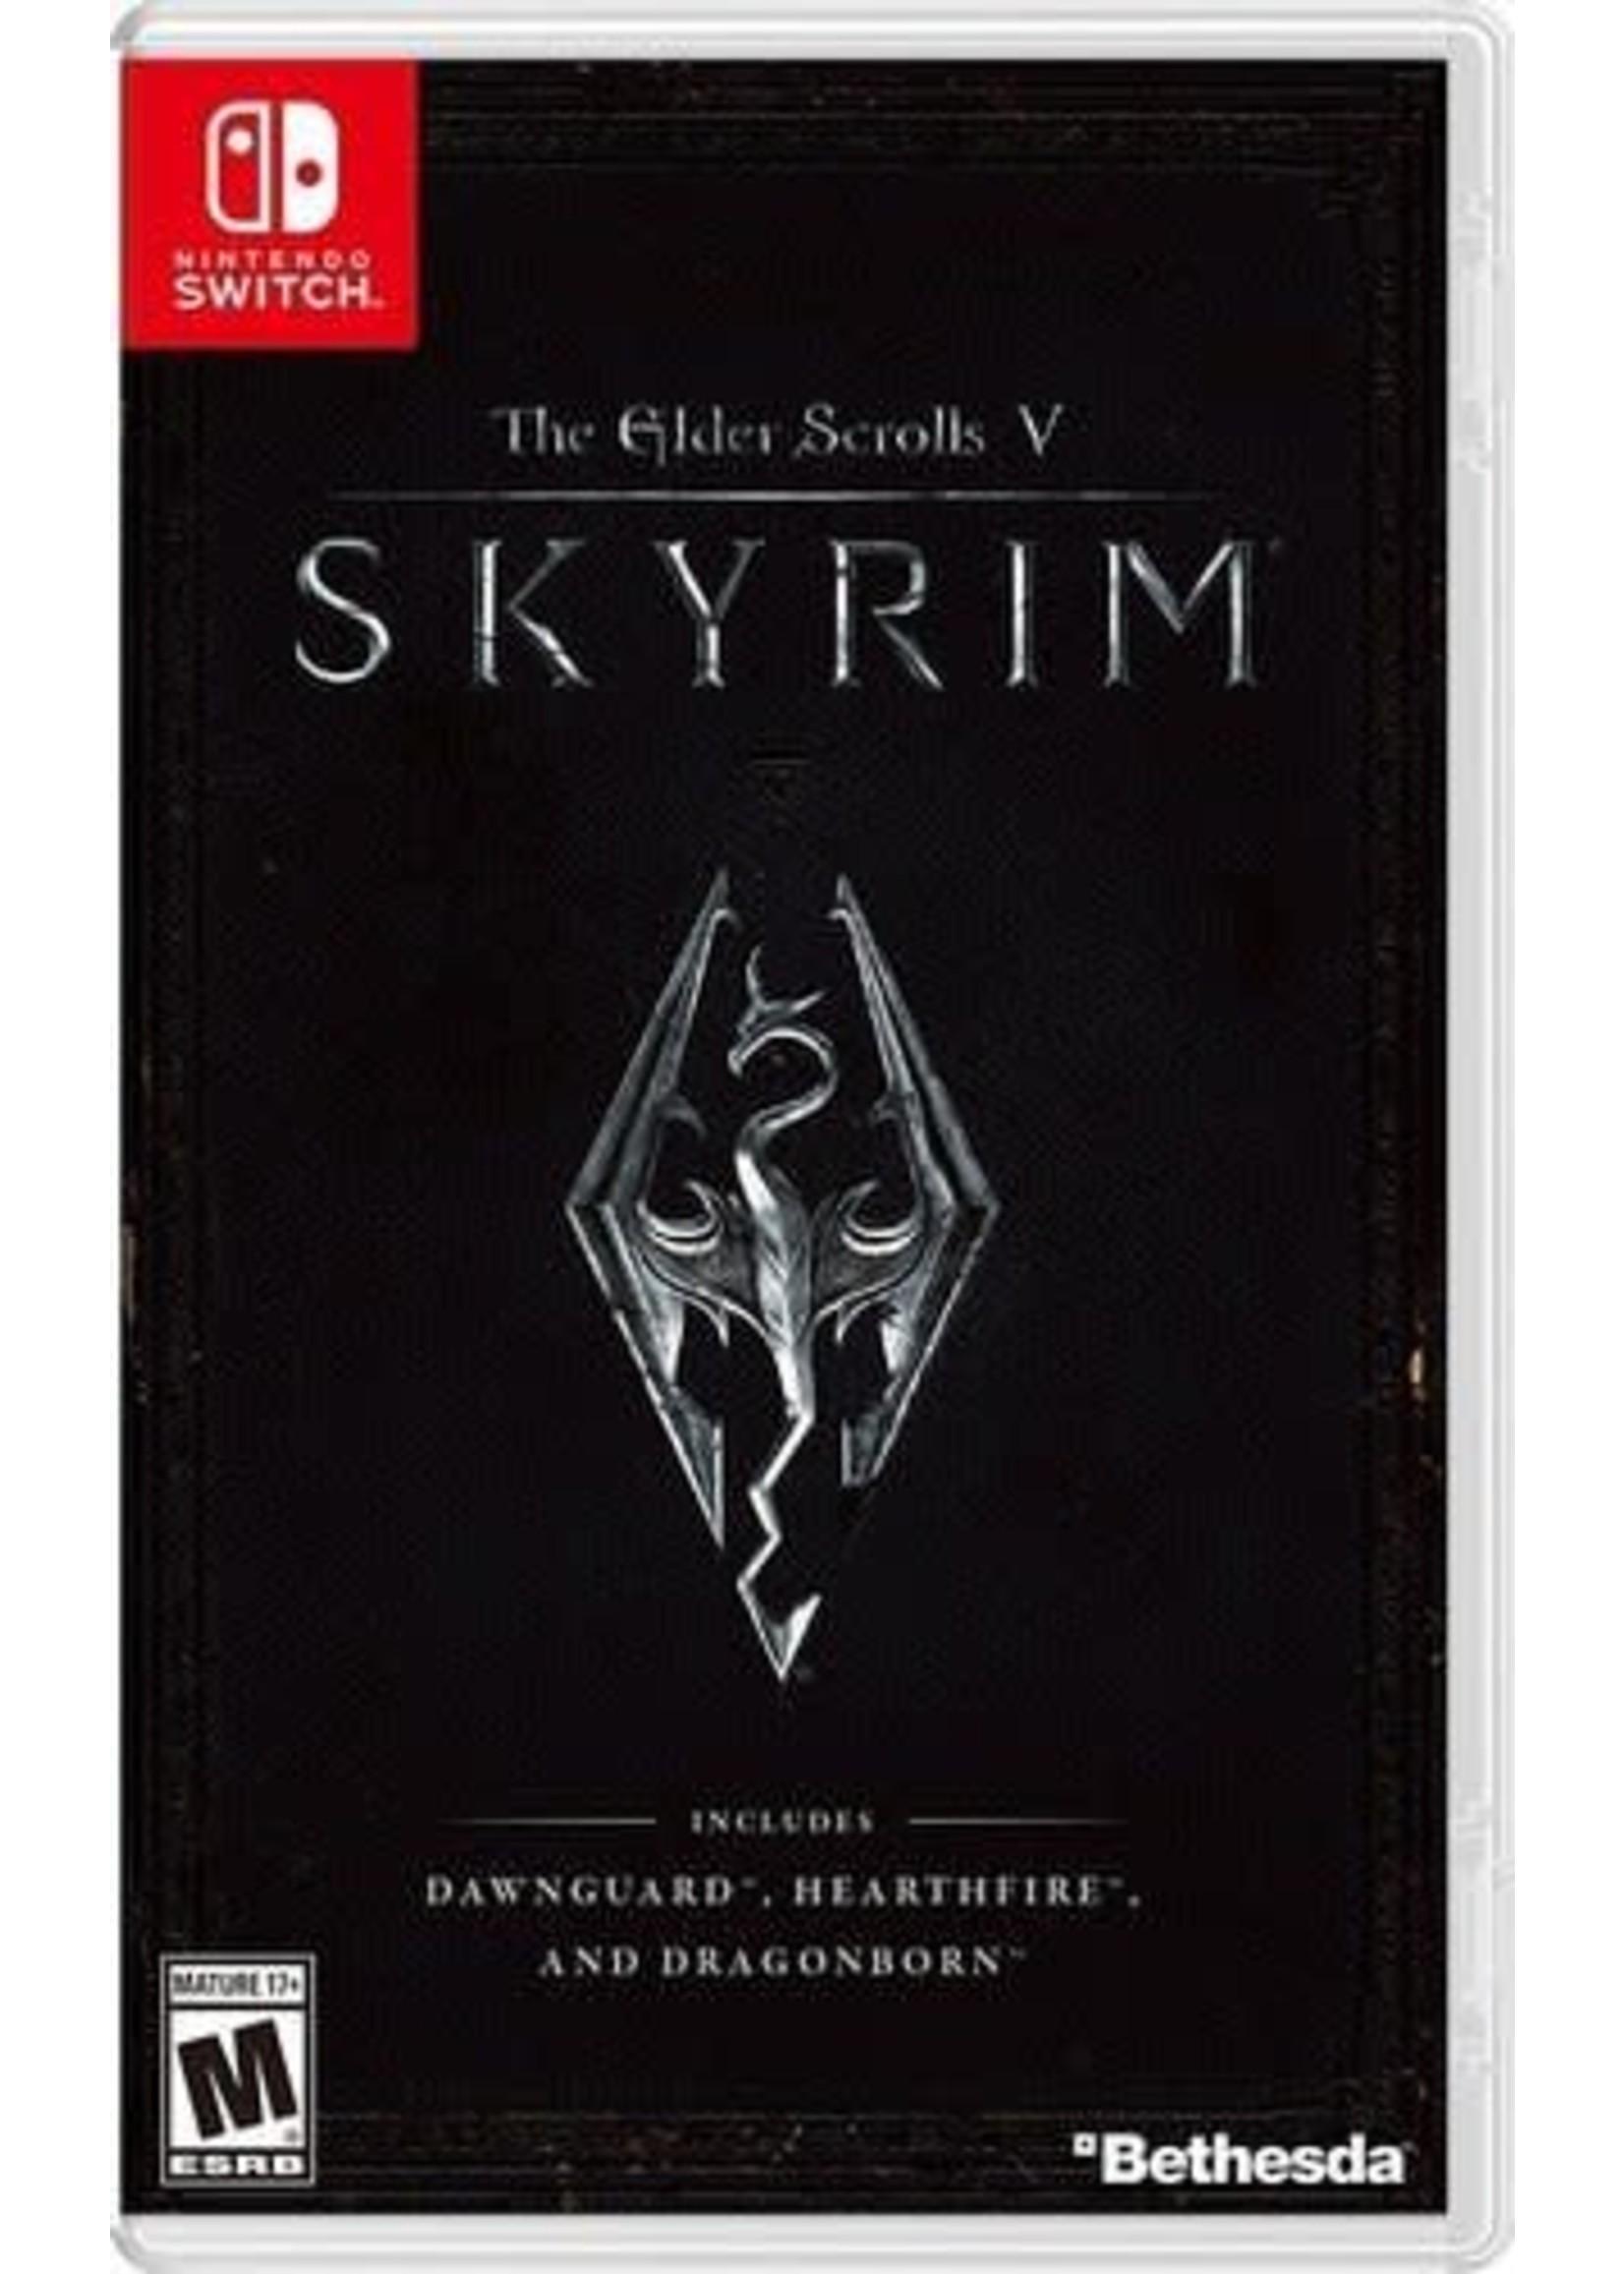 The Elder Scrolls 5: Skyrim - SWITCH NEW